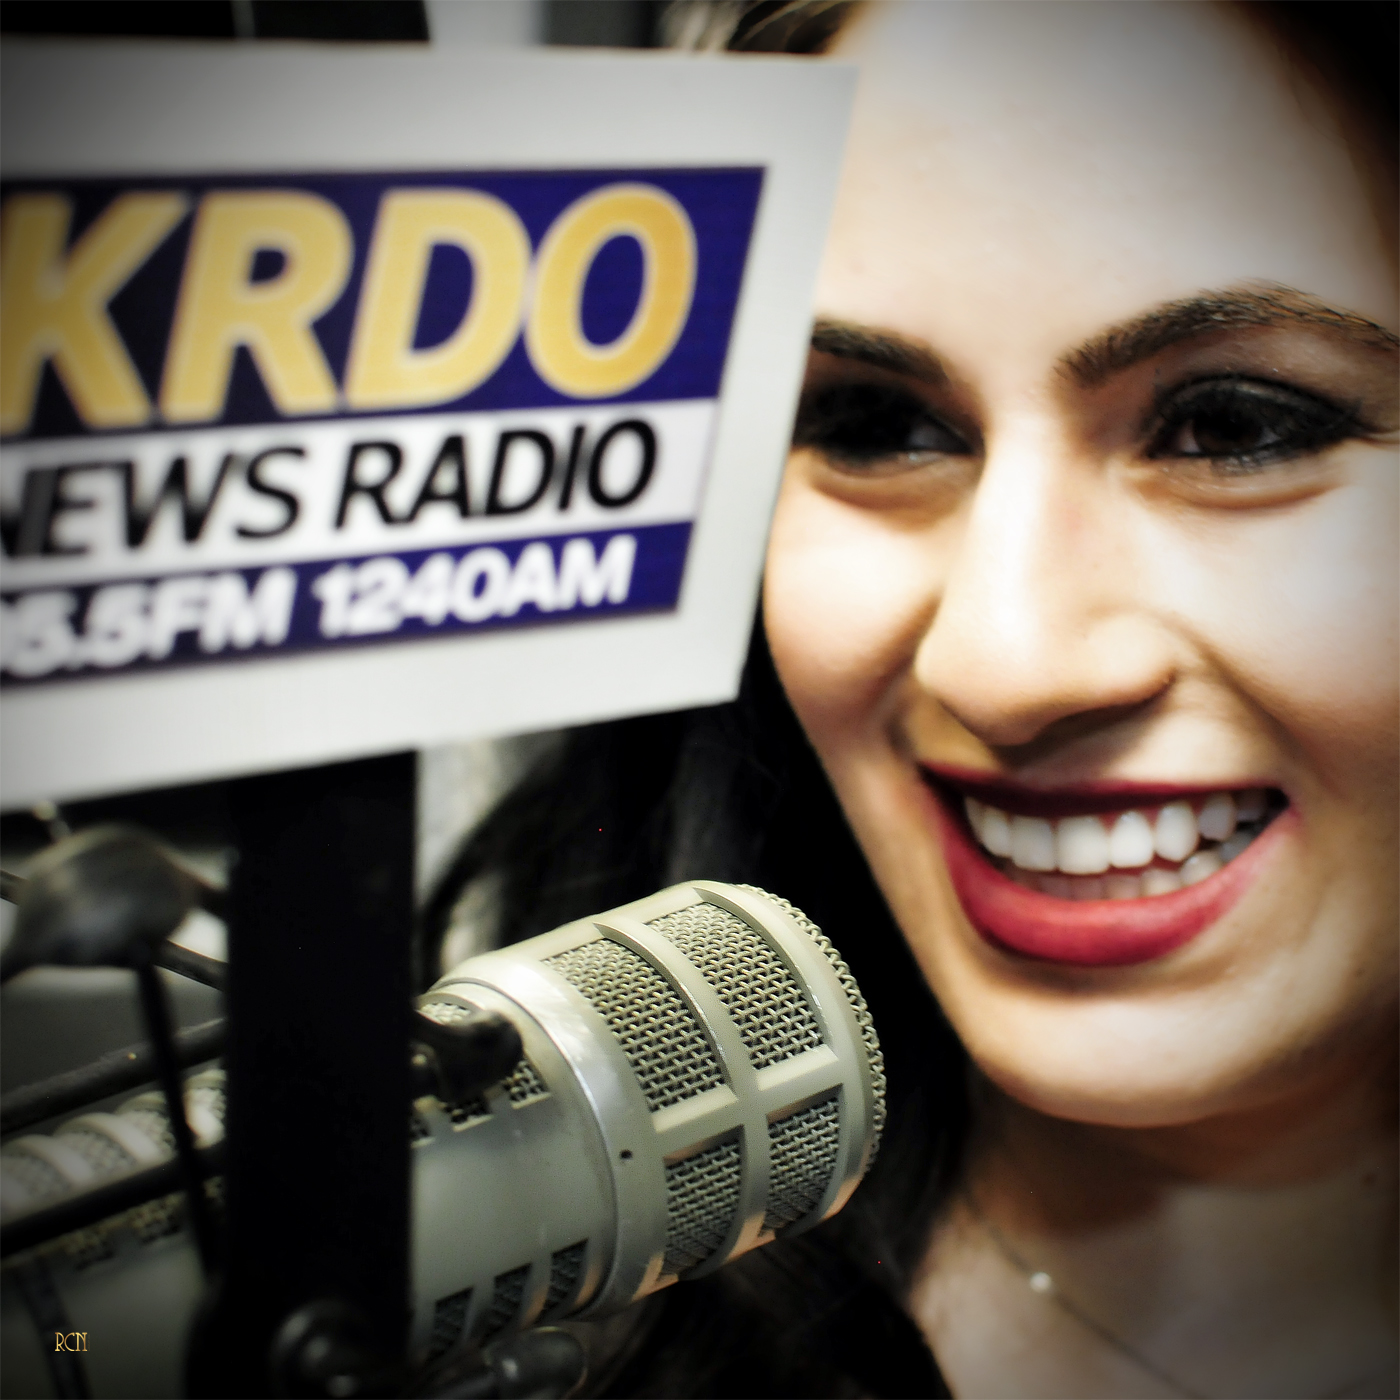 KRDO News on Demand with Sheridan Fidelman - May 17, 2018